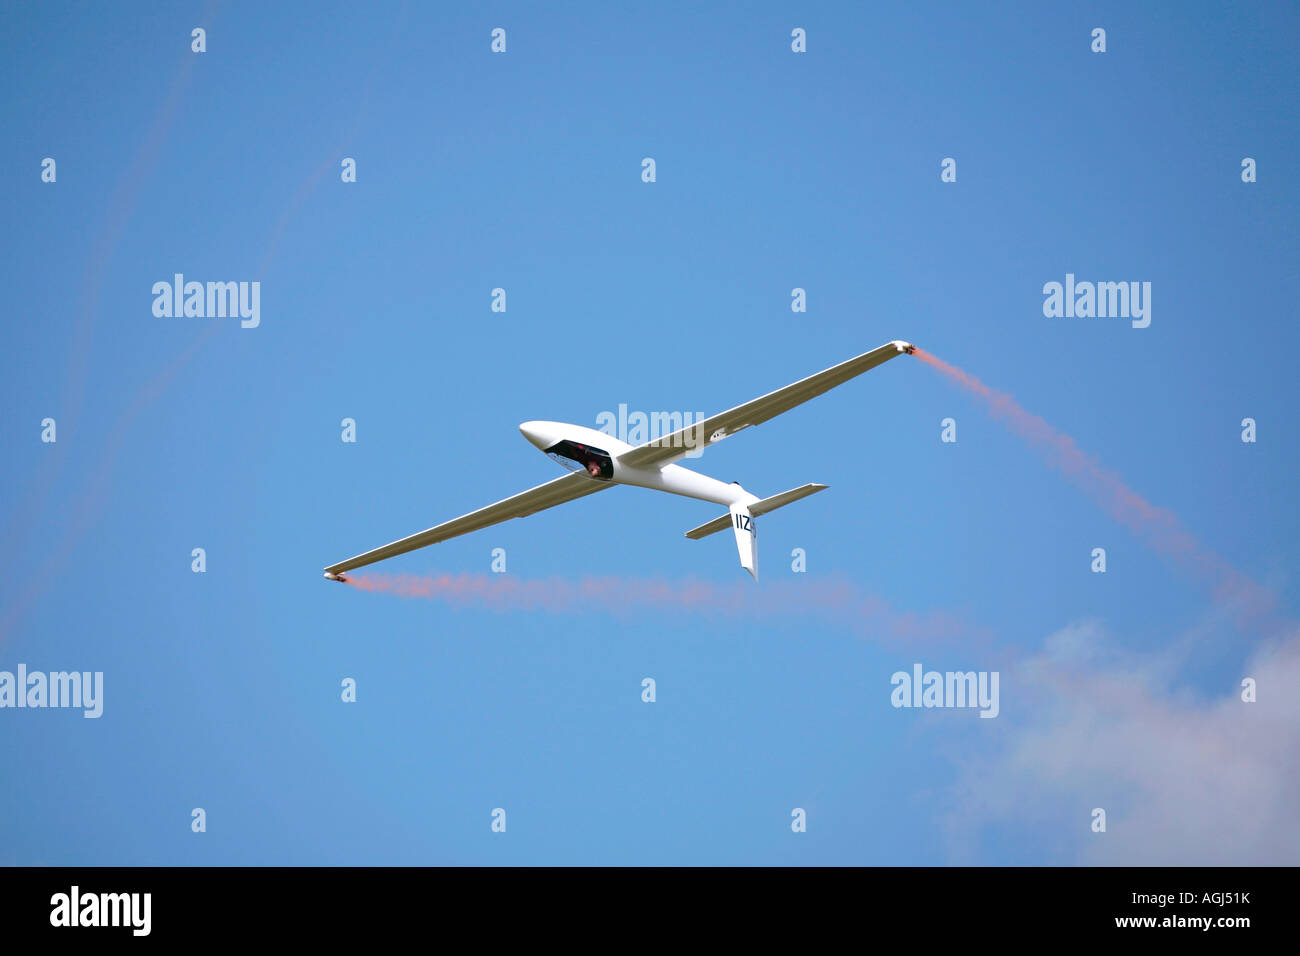 Guy Westgate piloting S-1 Swift glider at Shoreham Airshow - Stock Image